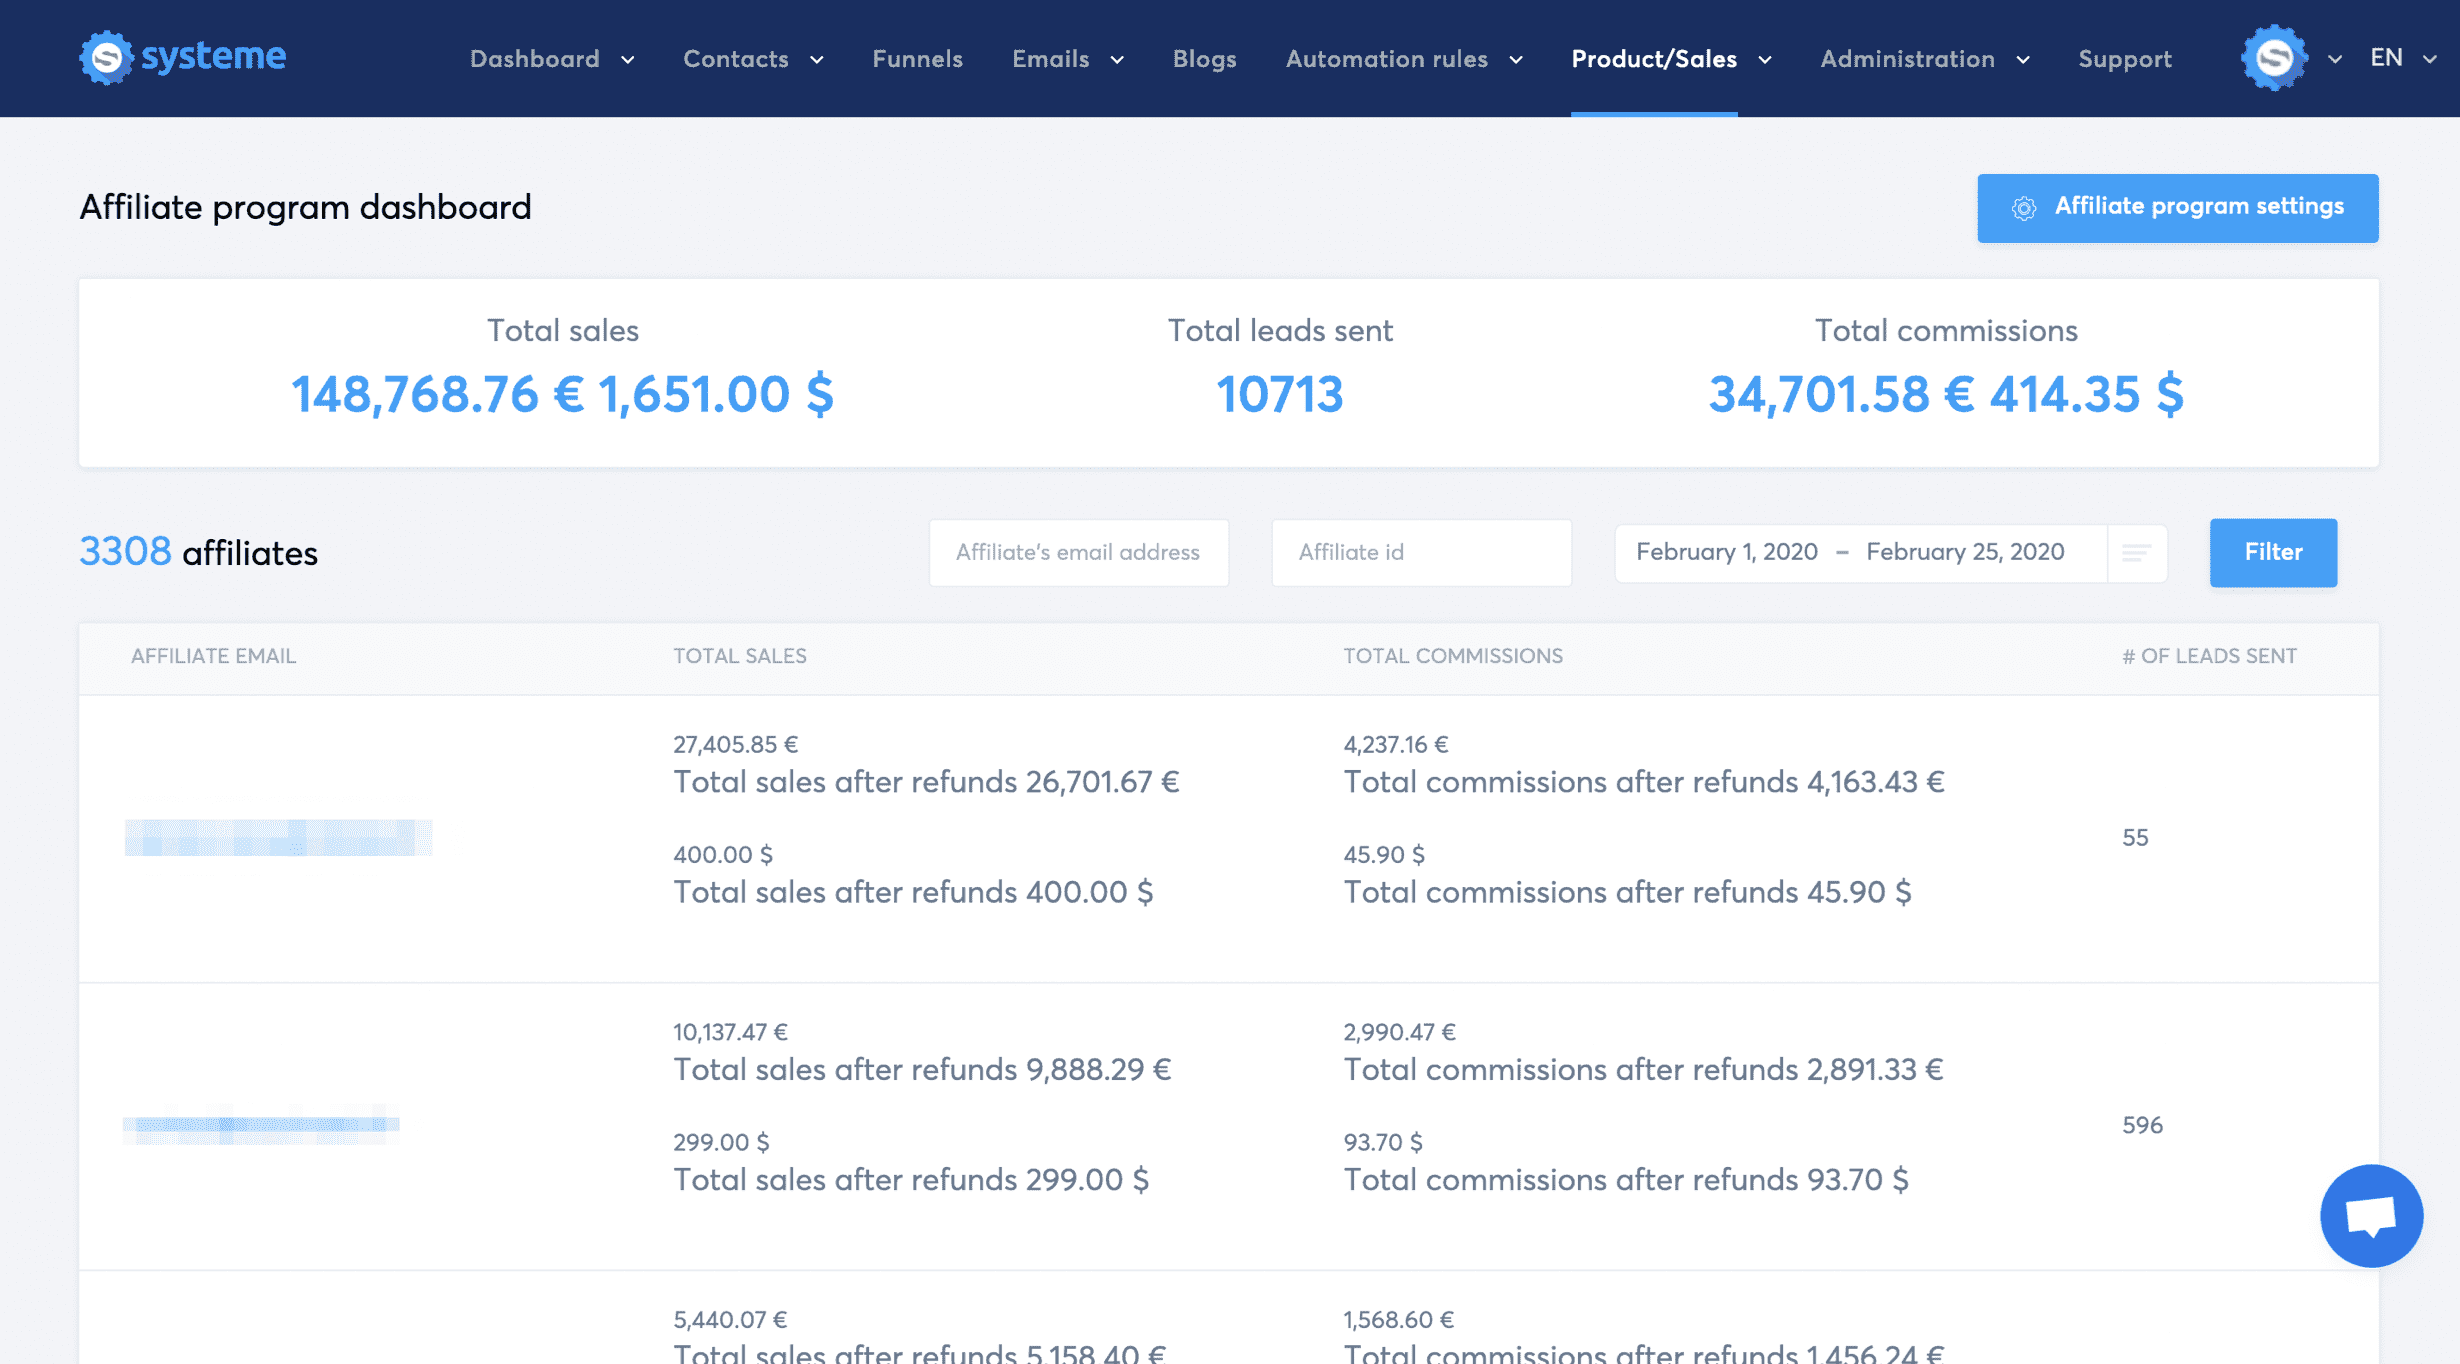 Systeme.io's affiliate program dashboard